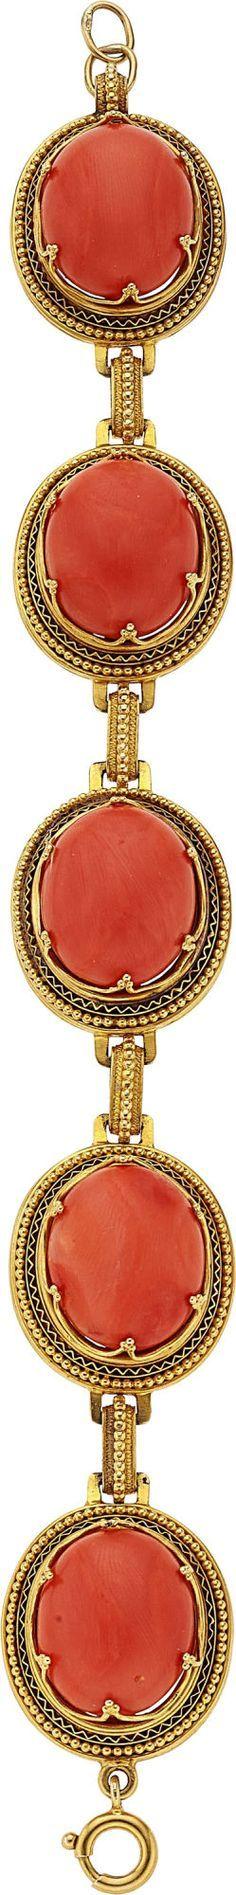 Estate Jewelry:Bracelets, Victorian Coral, Gold Bracelet. ... Image #1